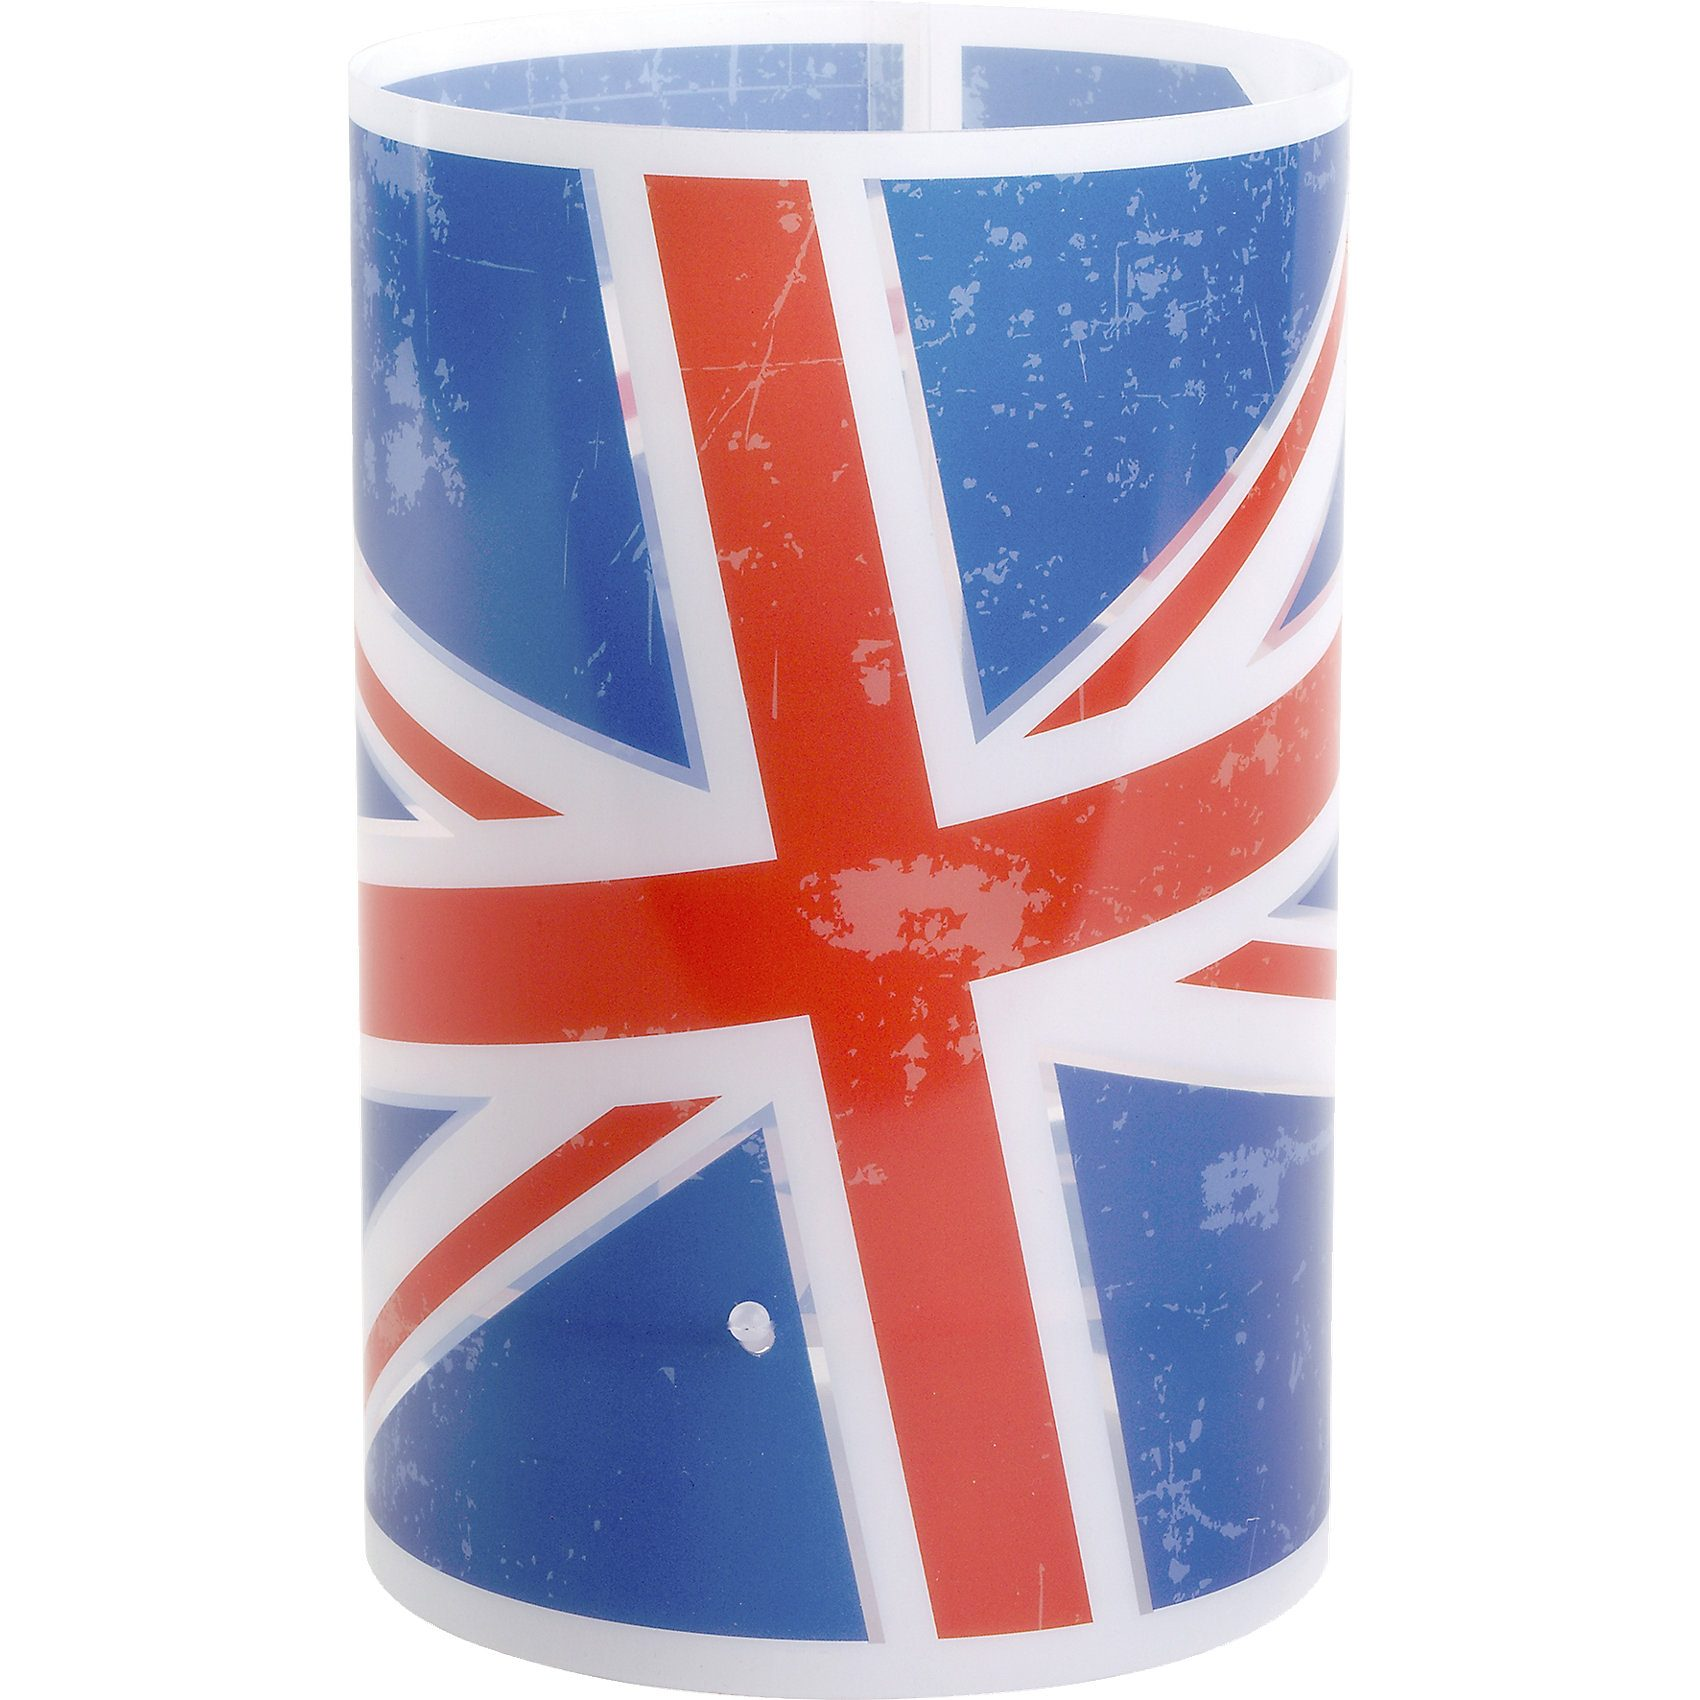 Dalber Tischlampe Union Jack, blau/rot